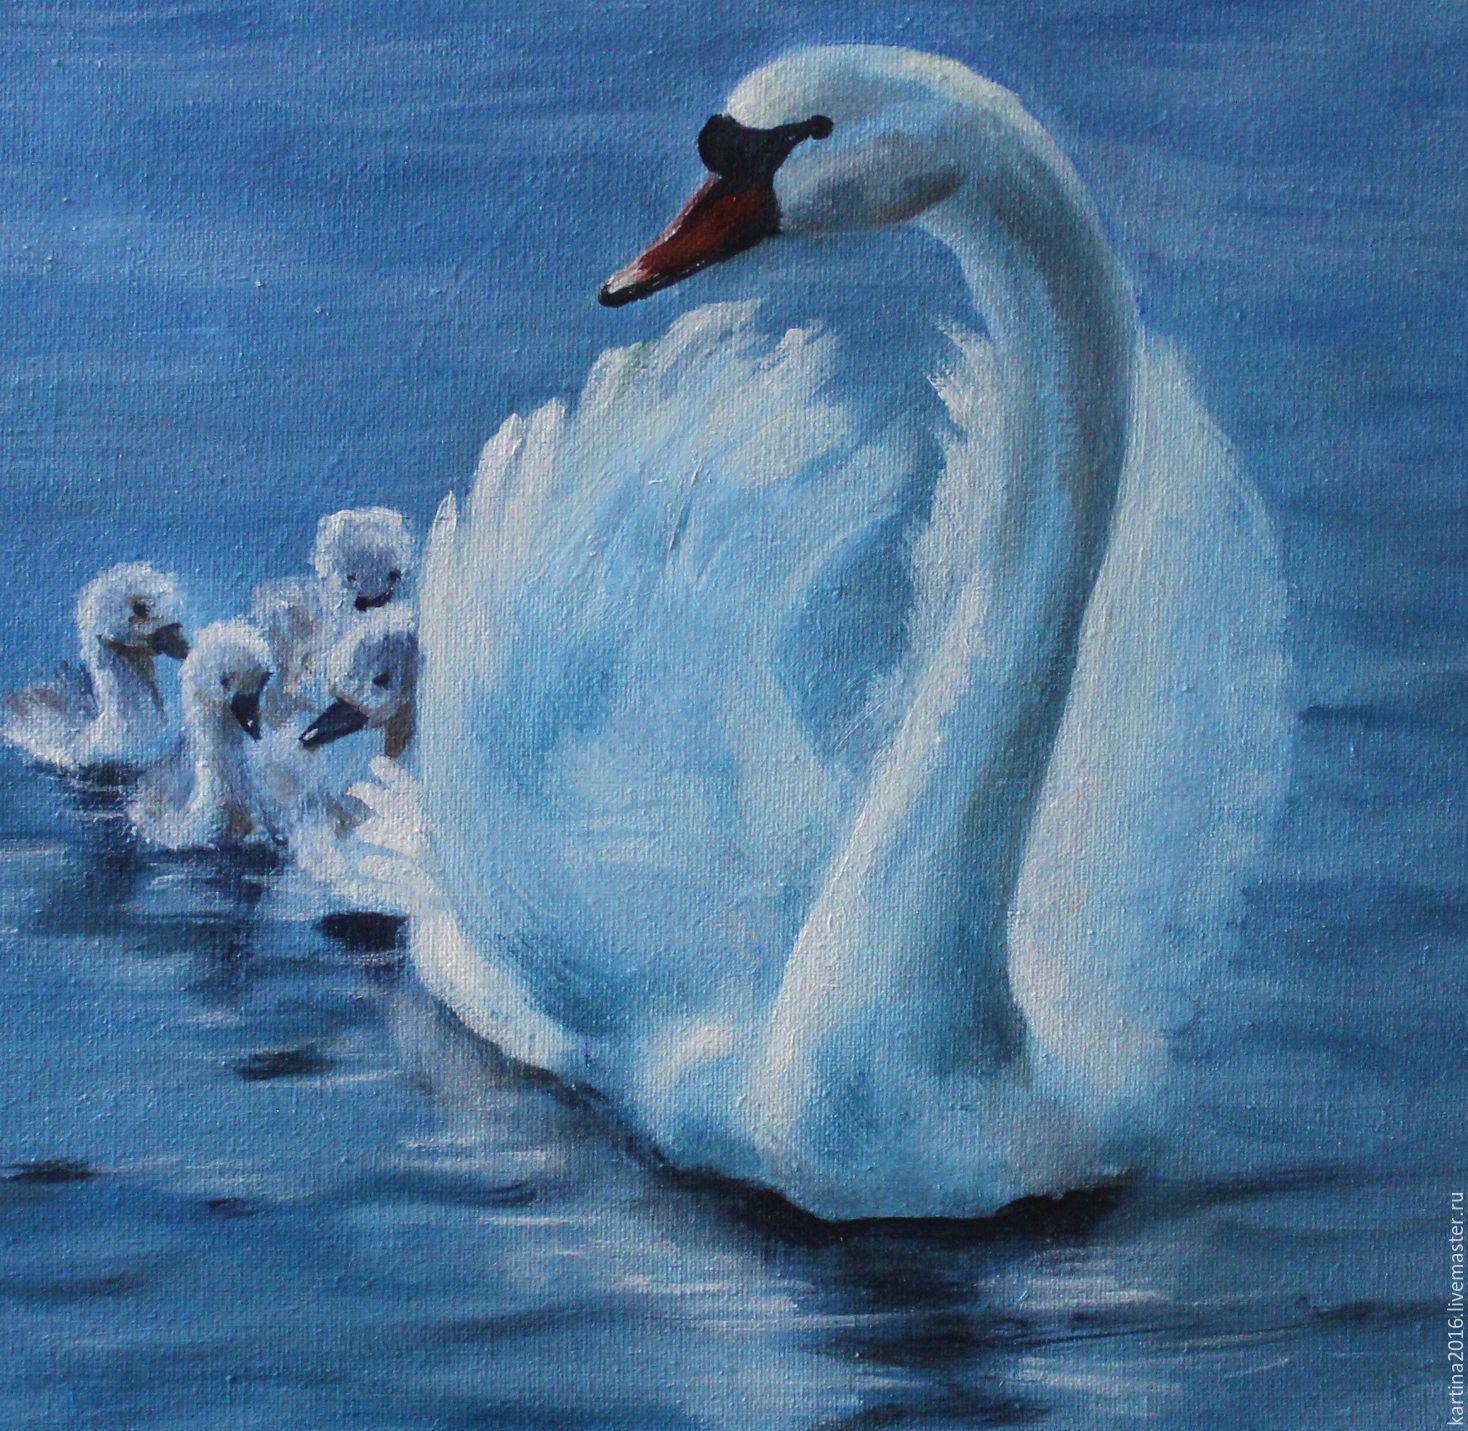 К�пи�� Лебед� изоб�ажение лебедя вода ка��ина ма�лом